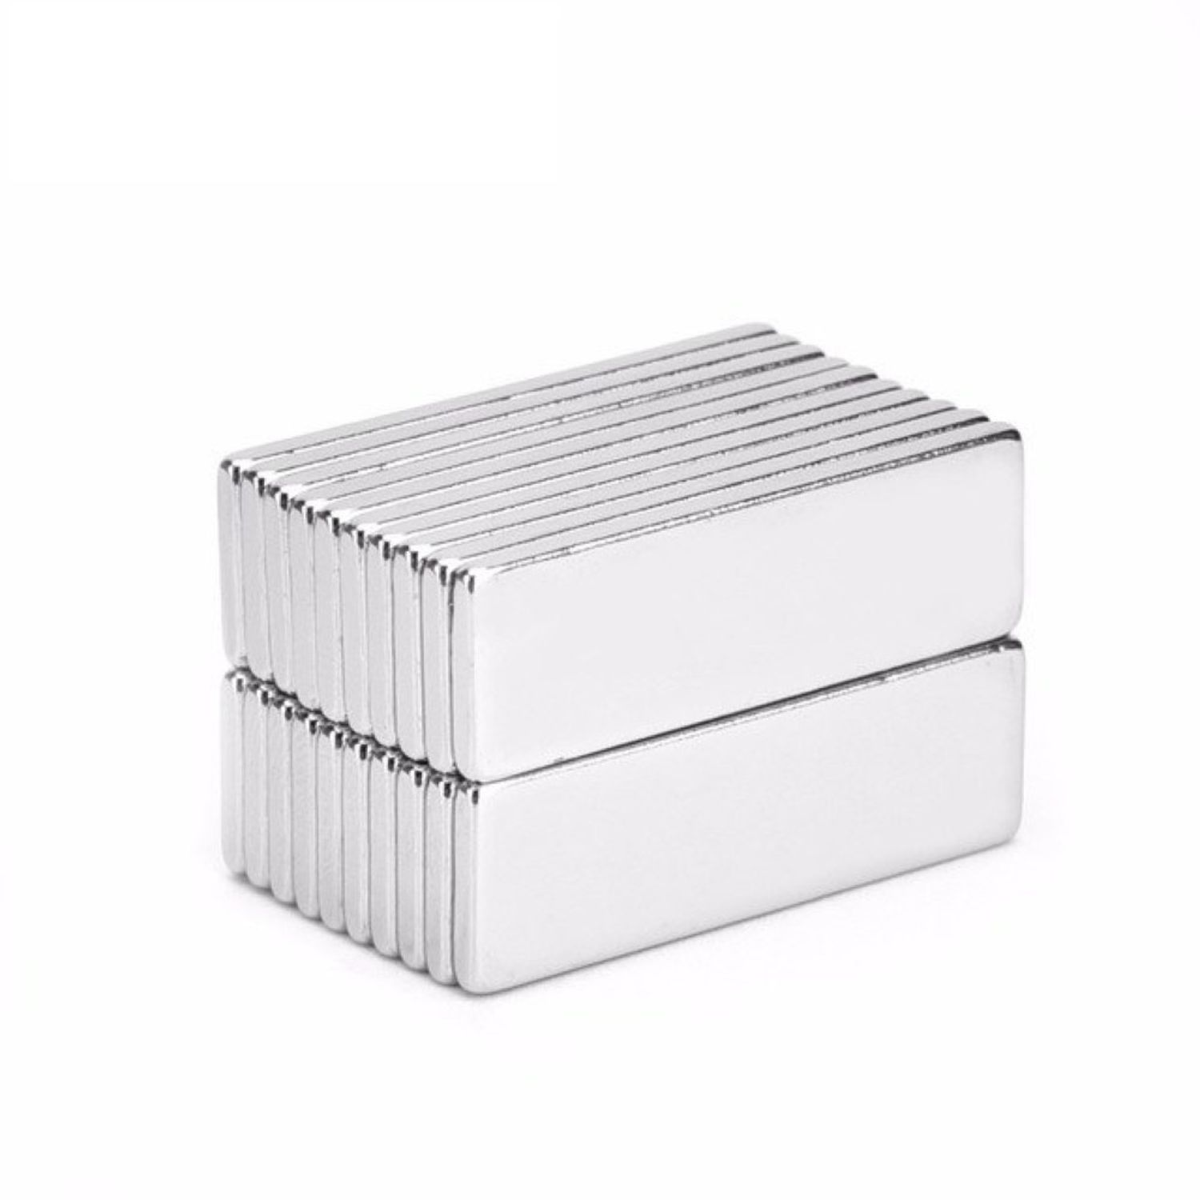 5 Stück Neodym Magnet 30 x 10 x 5 mm Supermagnete hohe Haftkraft Quadermagnet